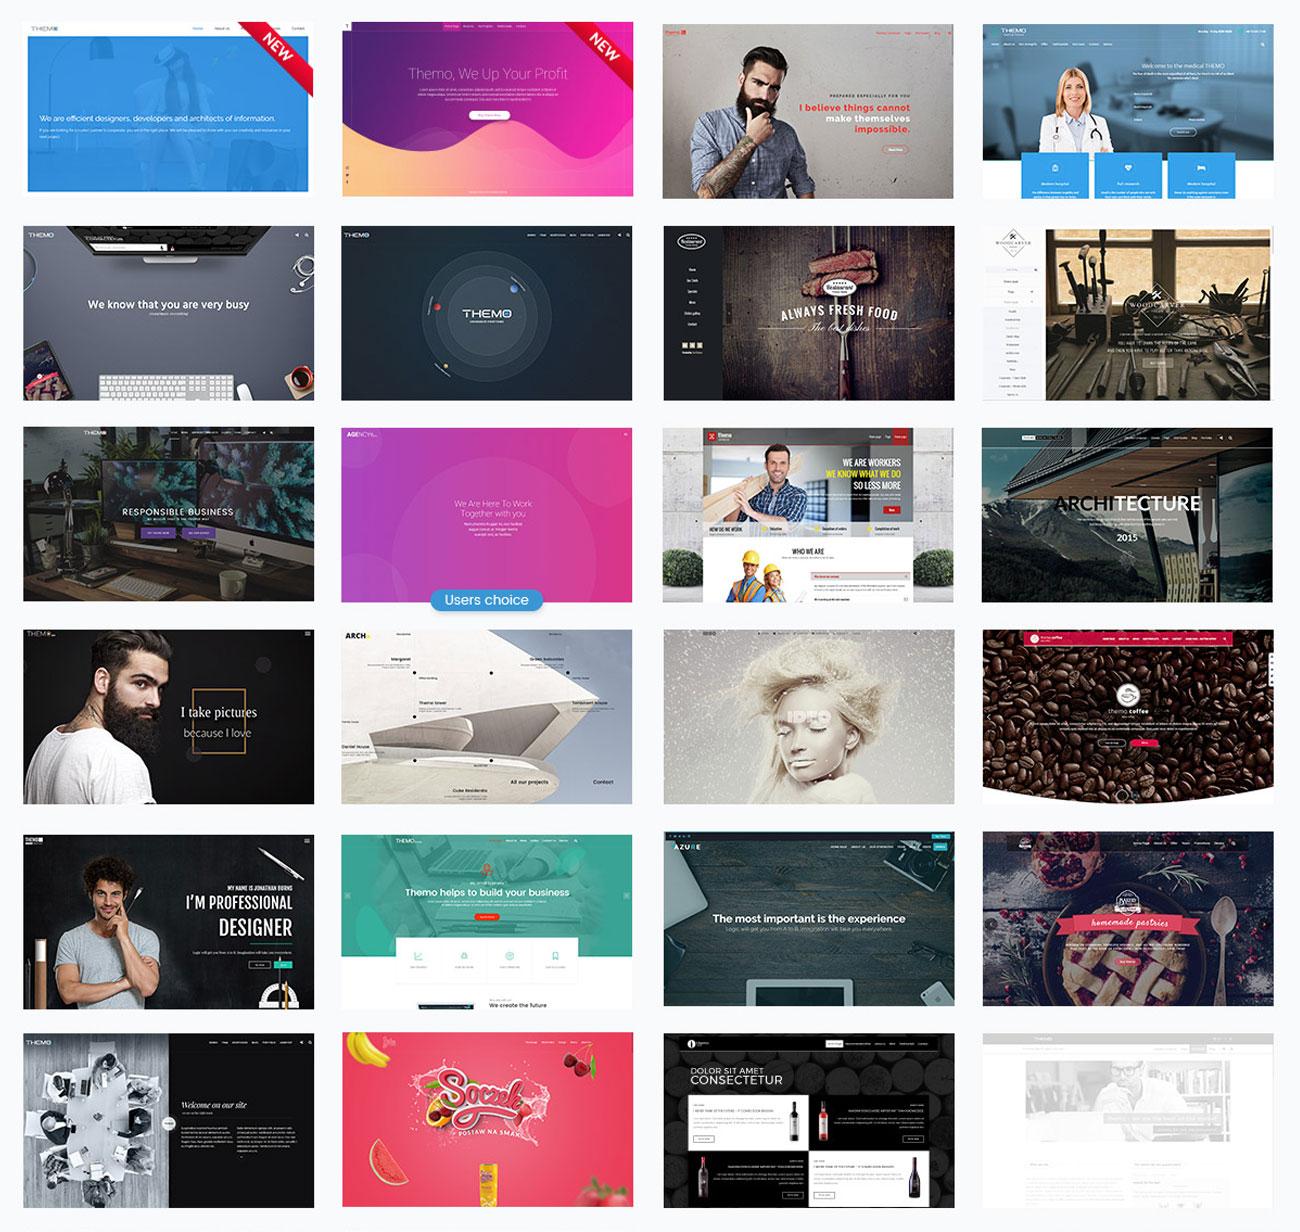 Themo - Creative Parallax WordPress Theme